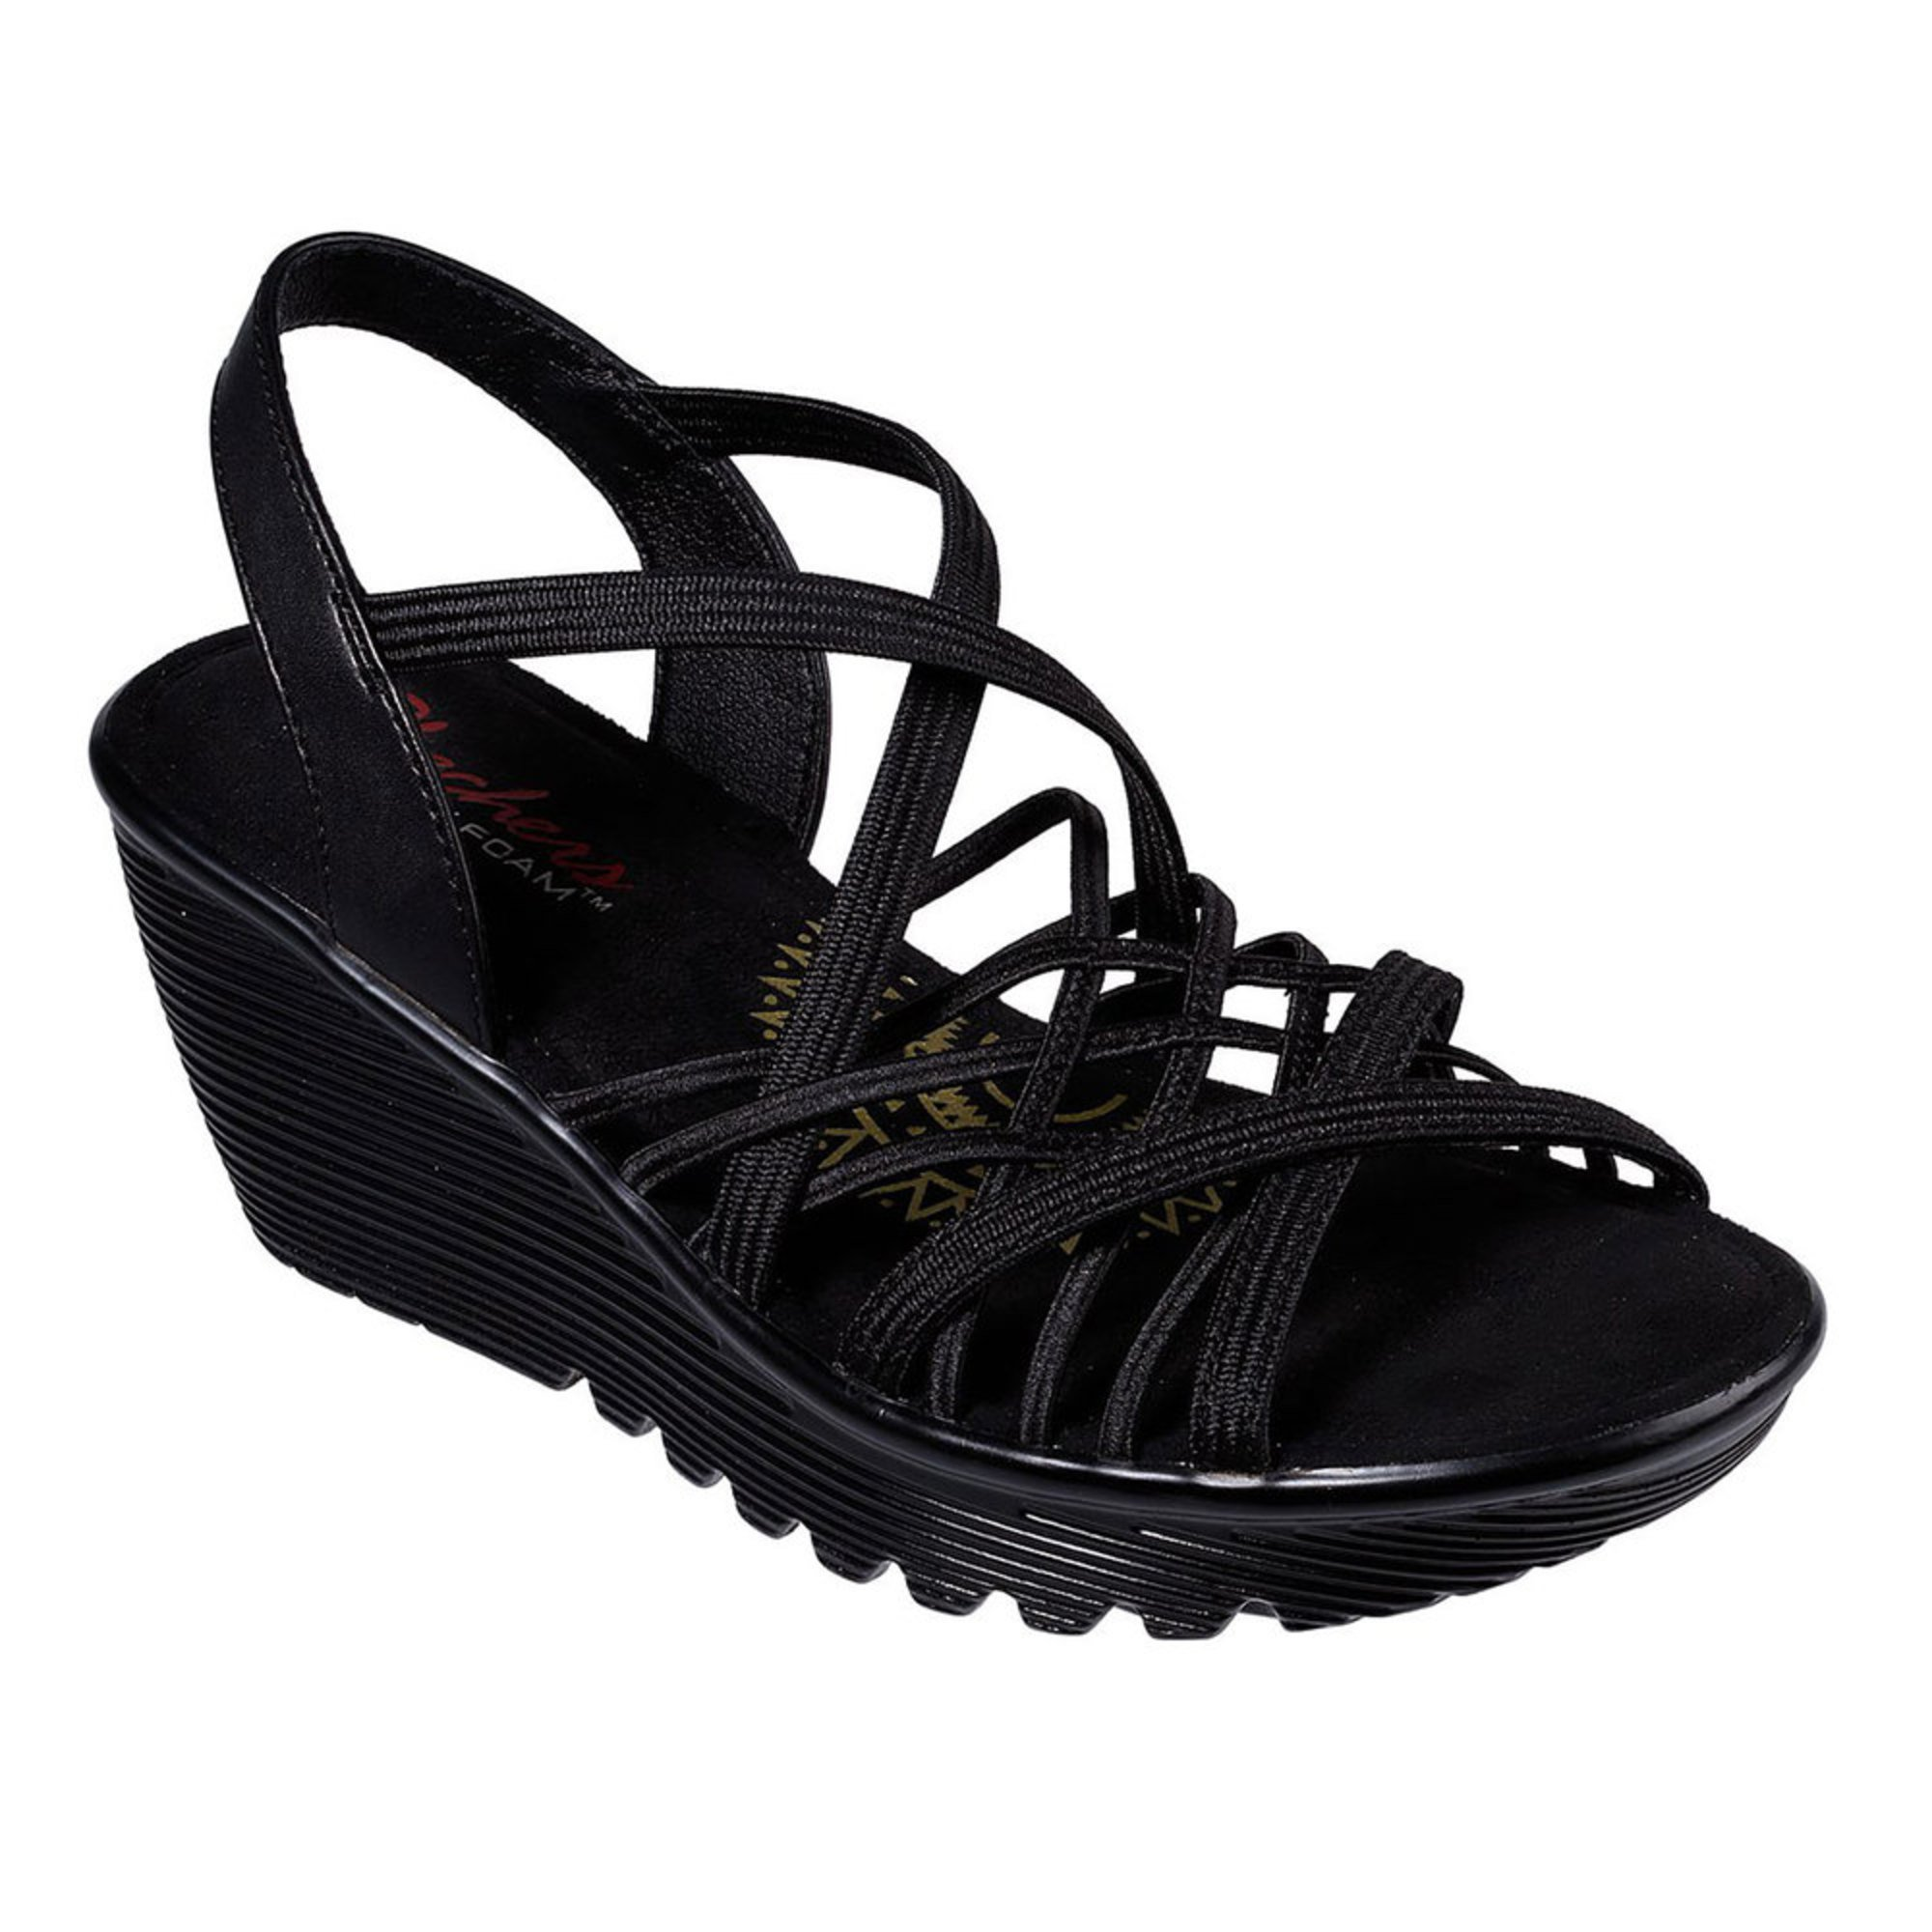 0c83f7b9eb Skechers Modern Comfort. Skechers Women's Modern Comfort Crossed Wires Wedge  Sandal